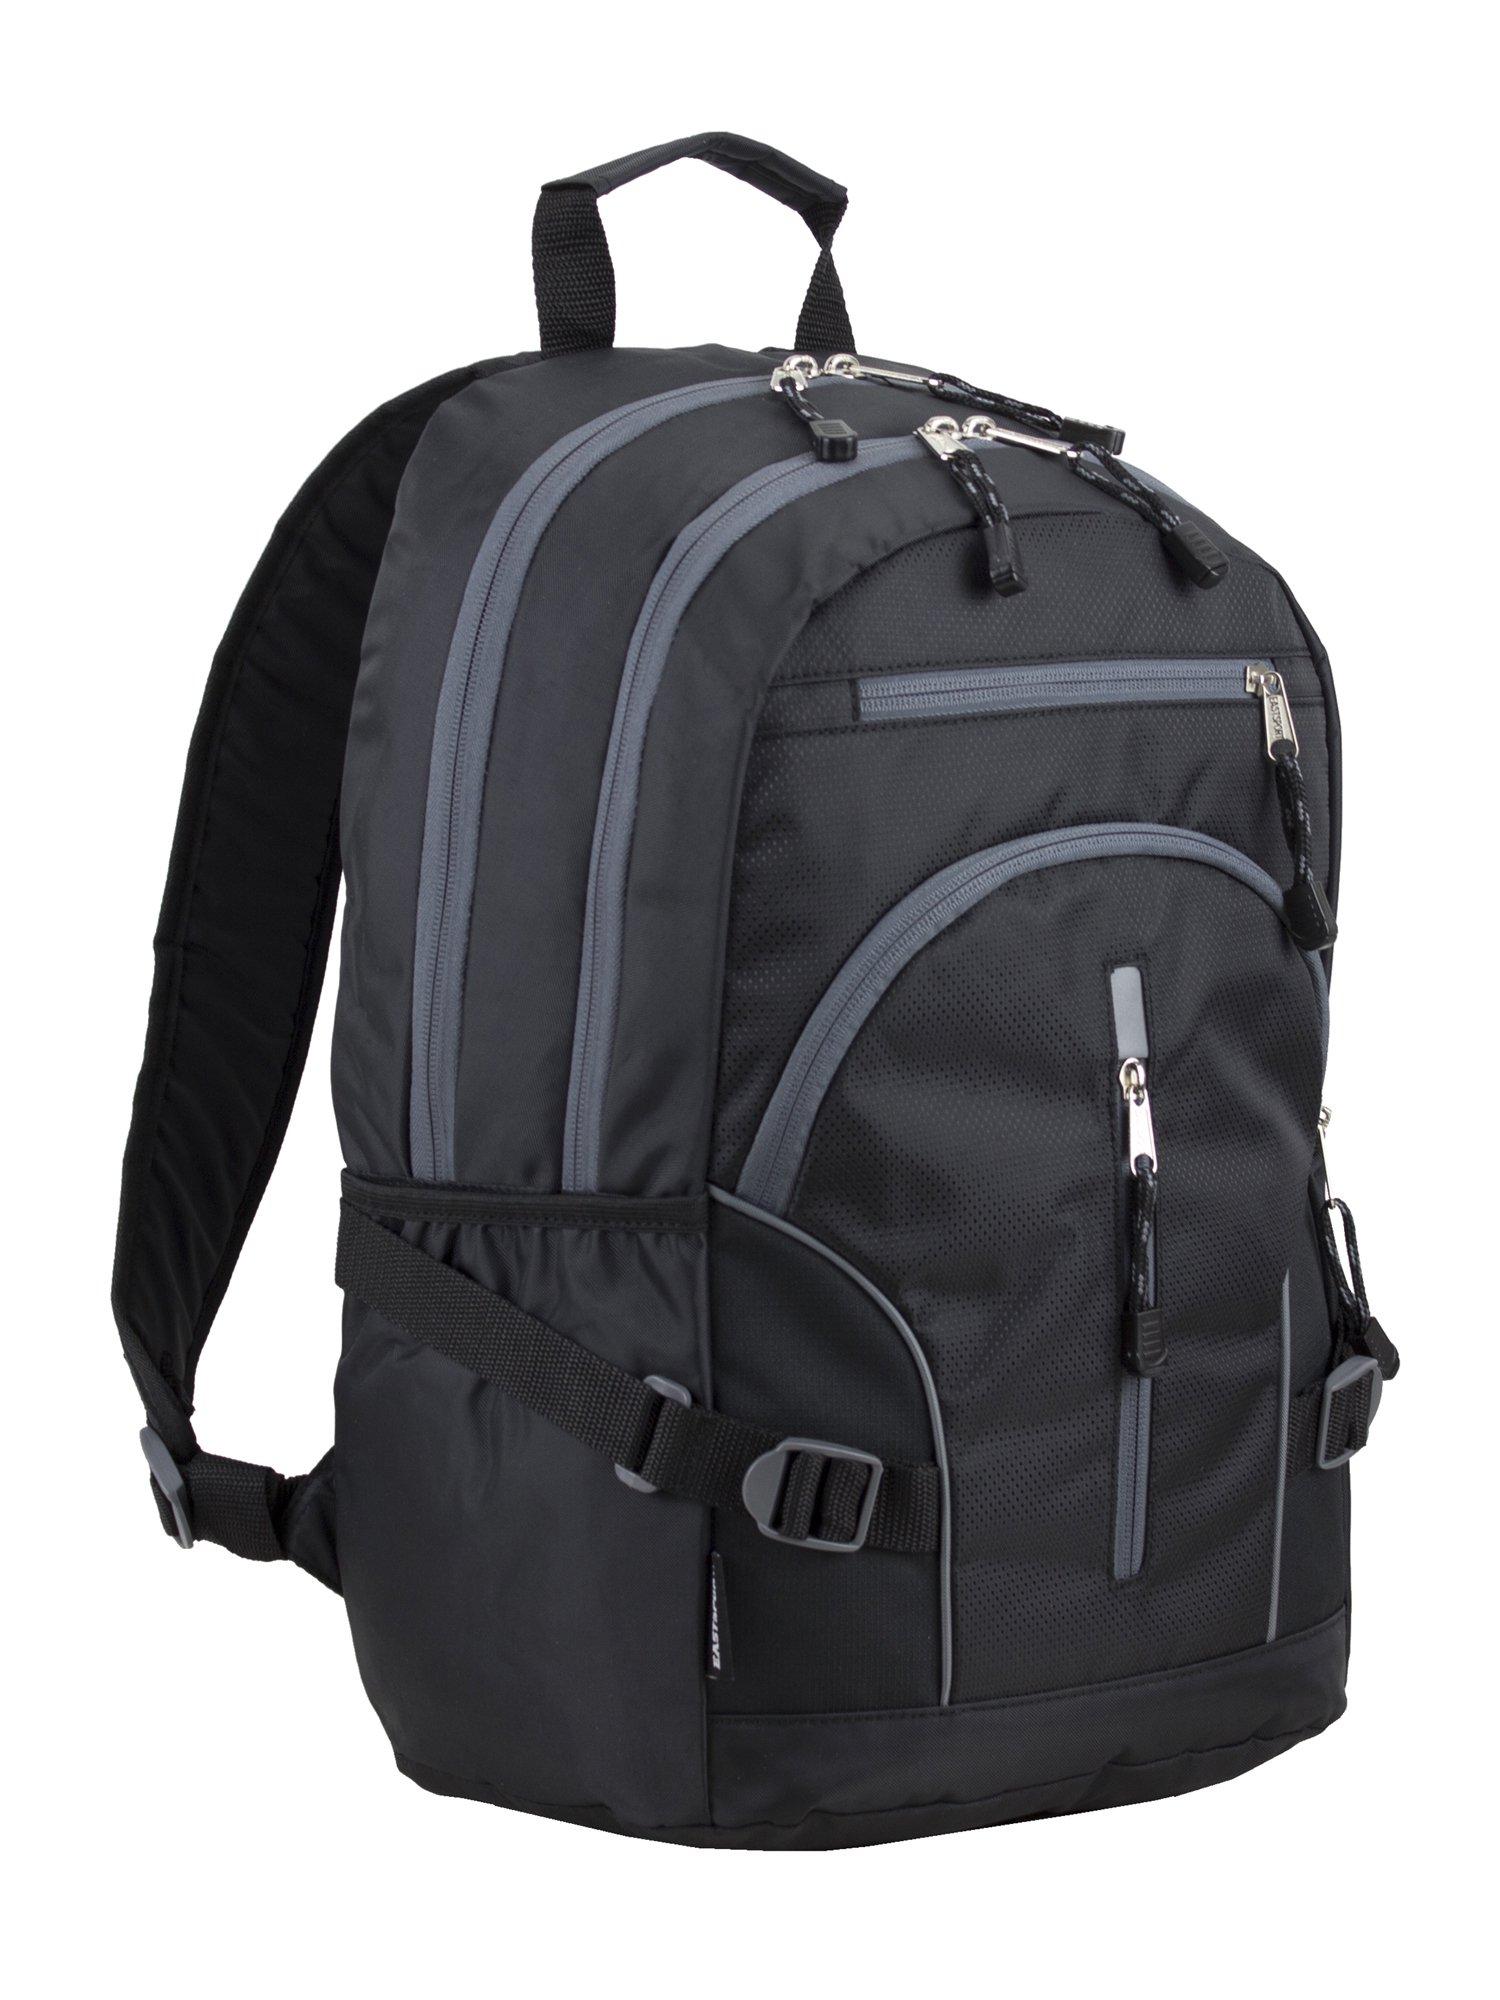 Eastsport Multi-Purpose Dynamic School Backpack